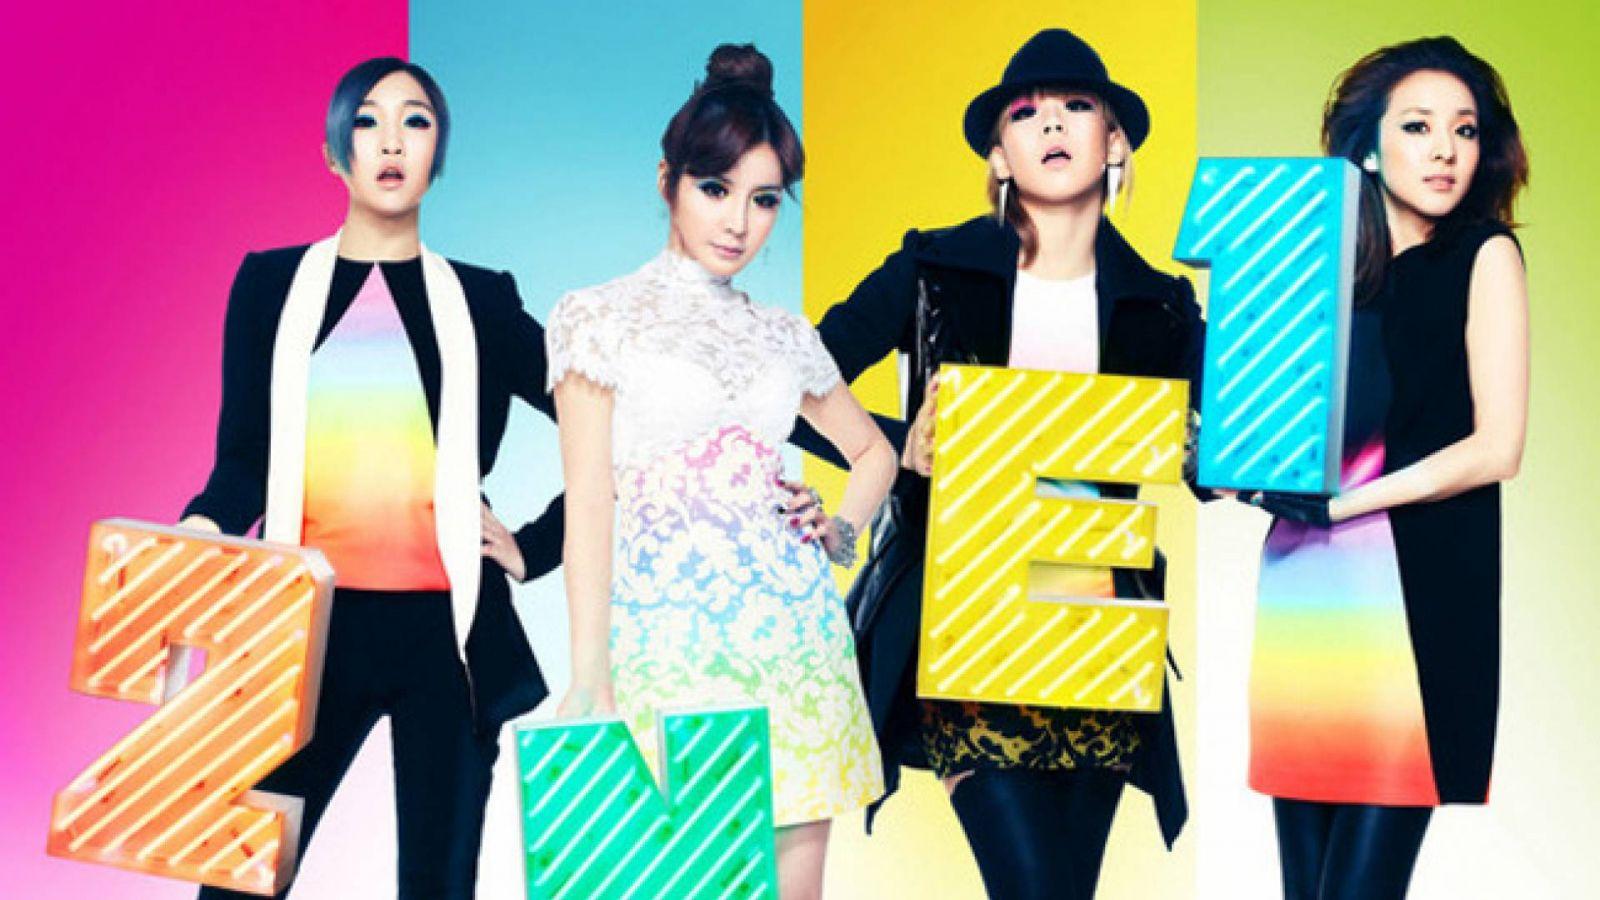 2NE1's Facebook Live Q&A © YG Entertainment